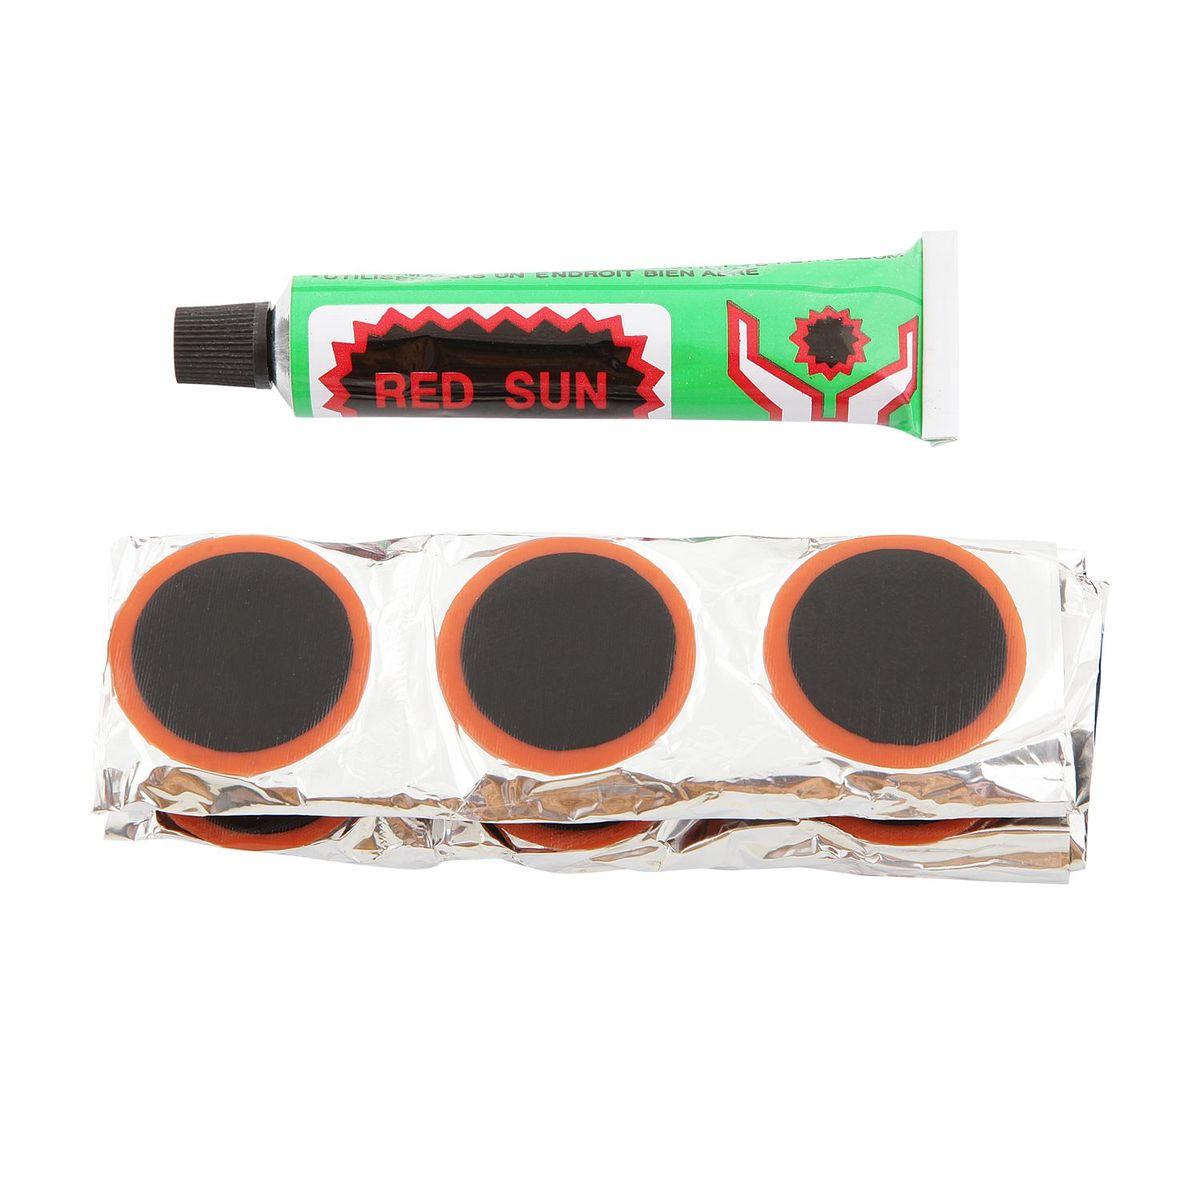 Аптечка для ремонта камер Hangzhou RS3601. Х46011Х46011Аптечка для ремонта камер RS3601